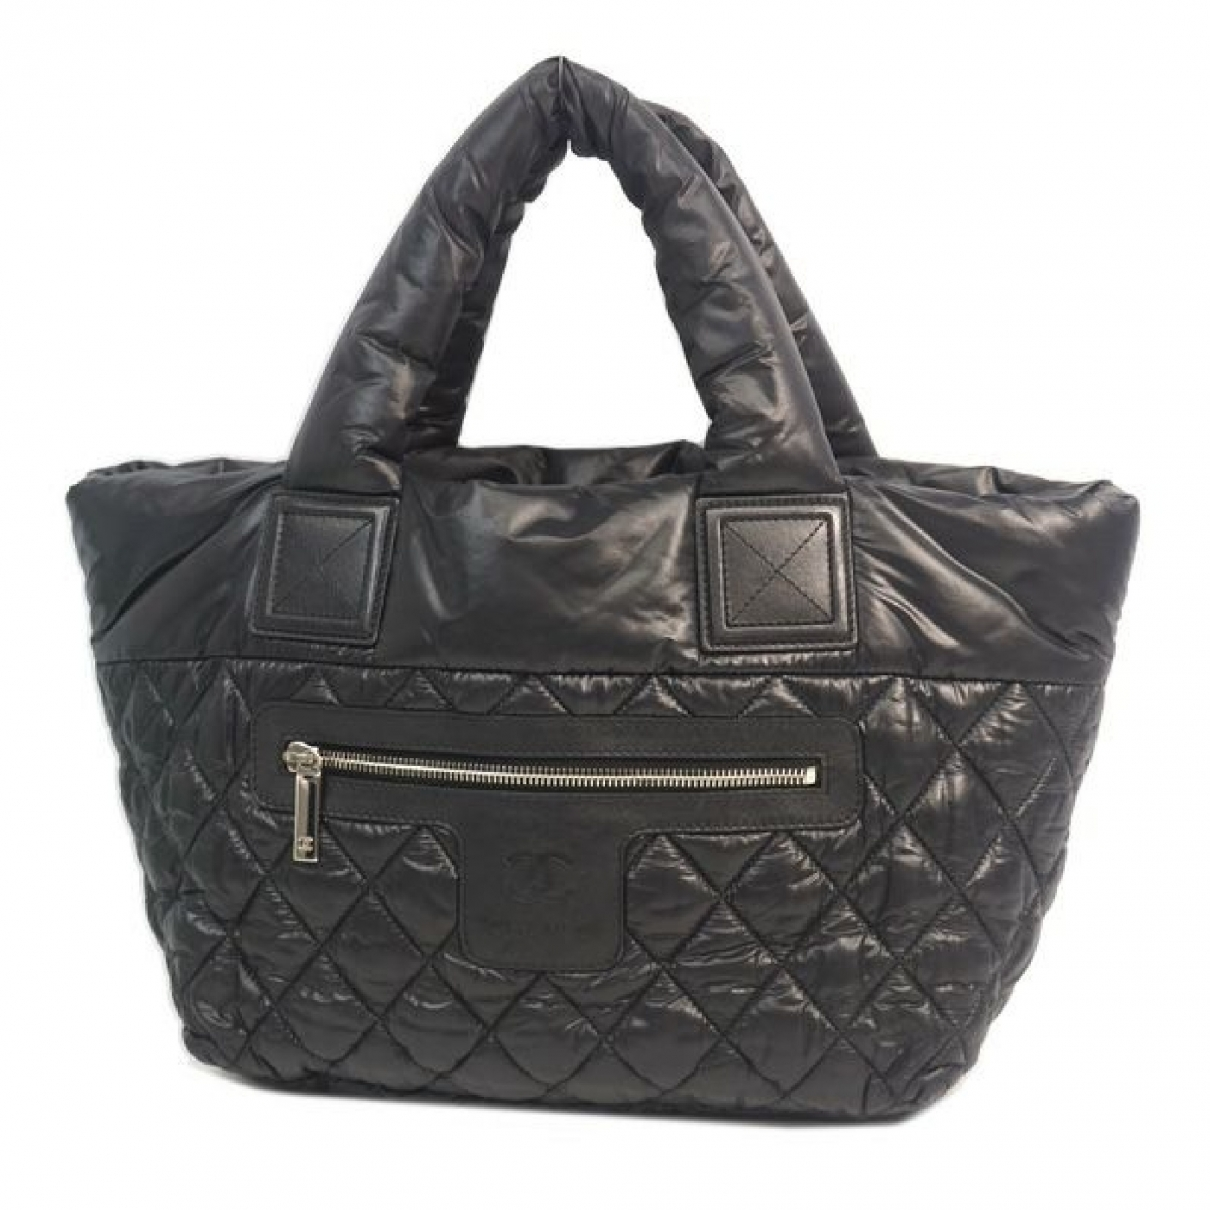 Chanel - Sac a main   pour femme en cuir